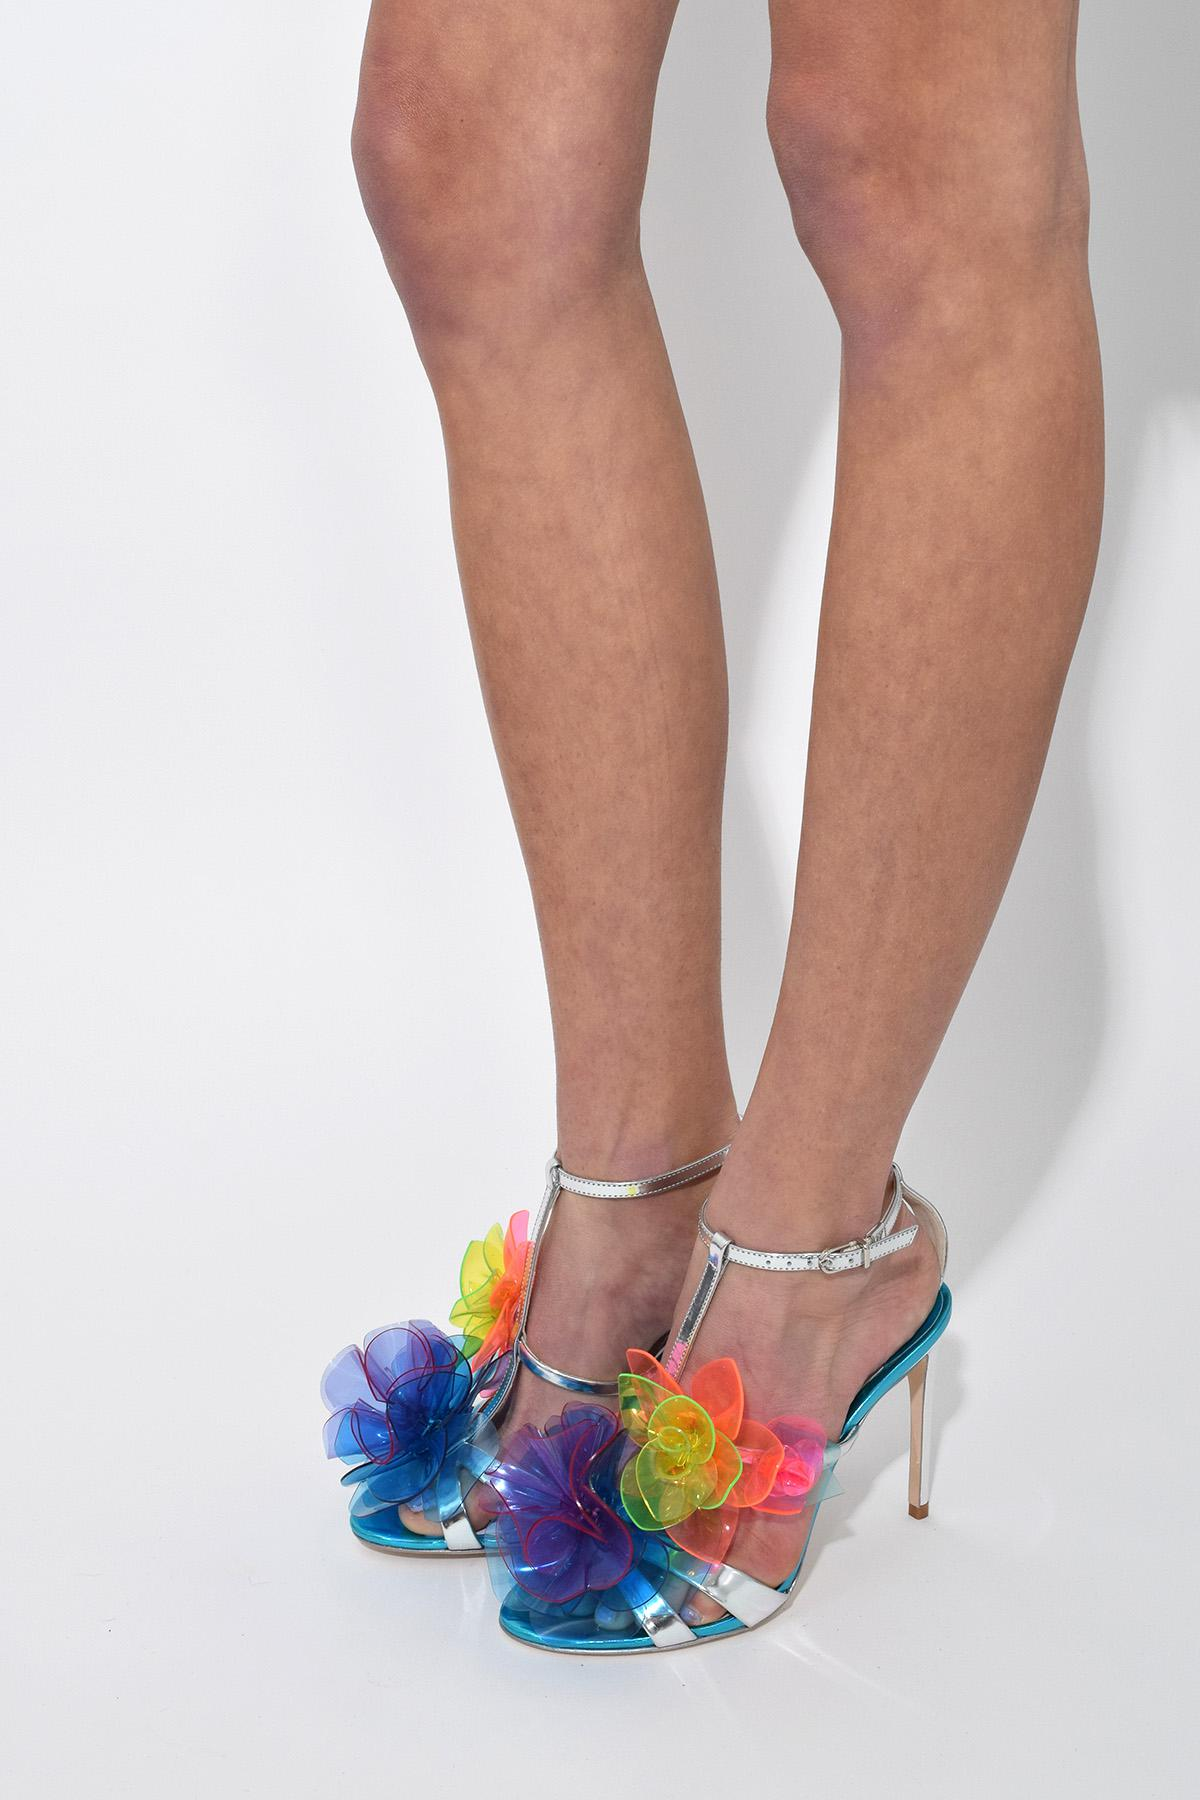 c65cc42bb4a Lyst - Sophia Webster Jumbo Lilico Sandal In Silver Multi in Metallic